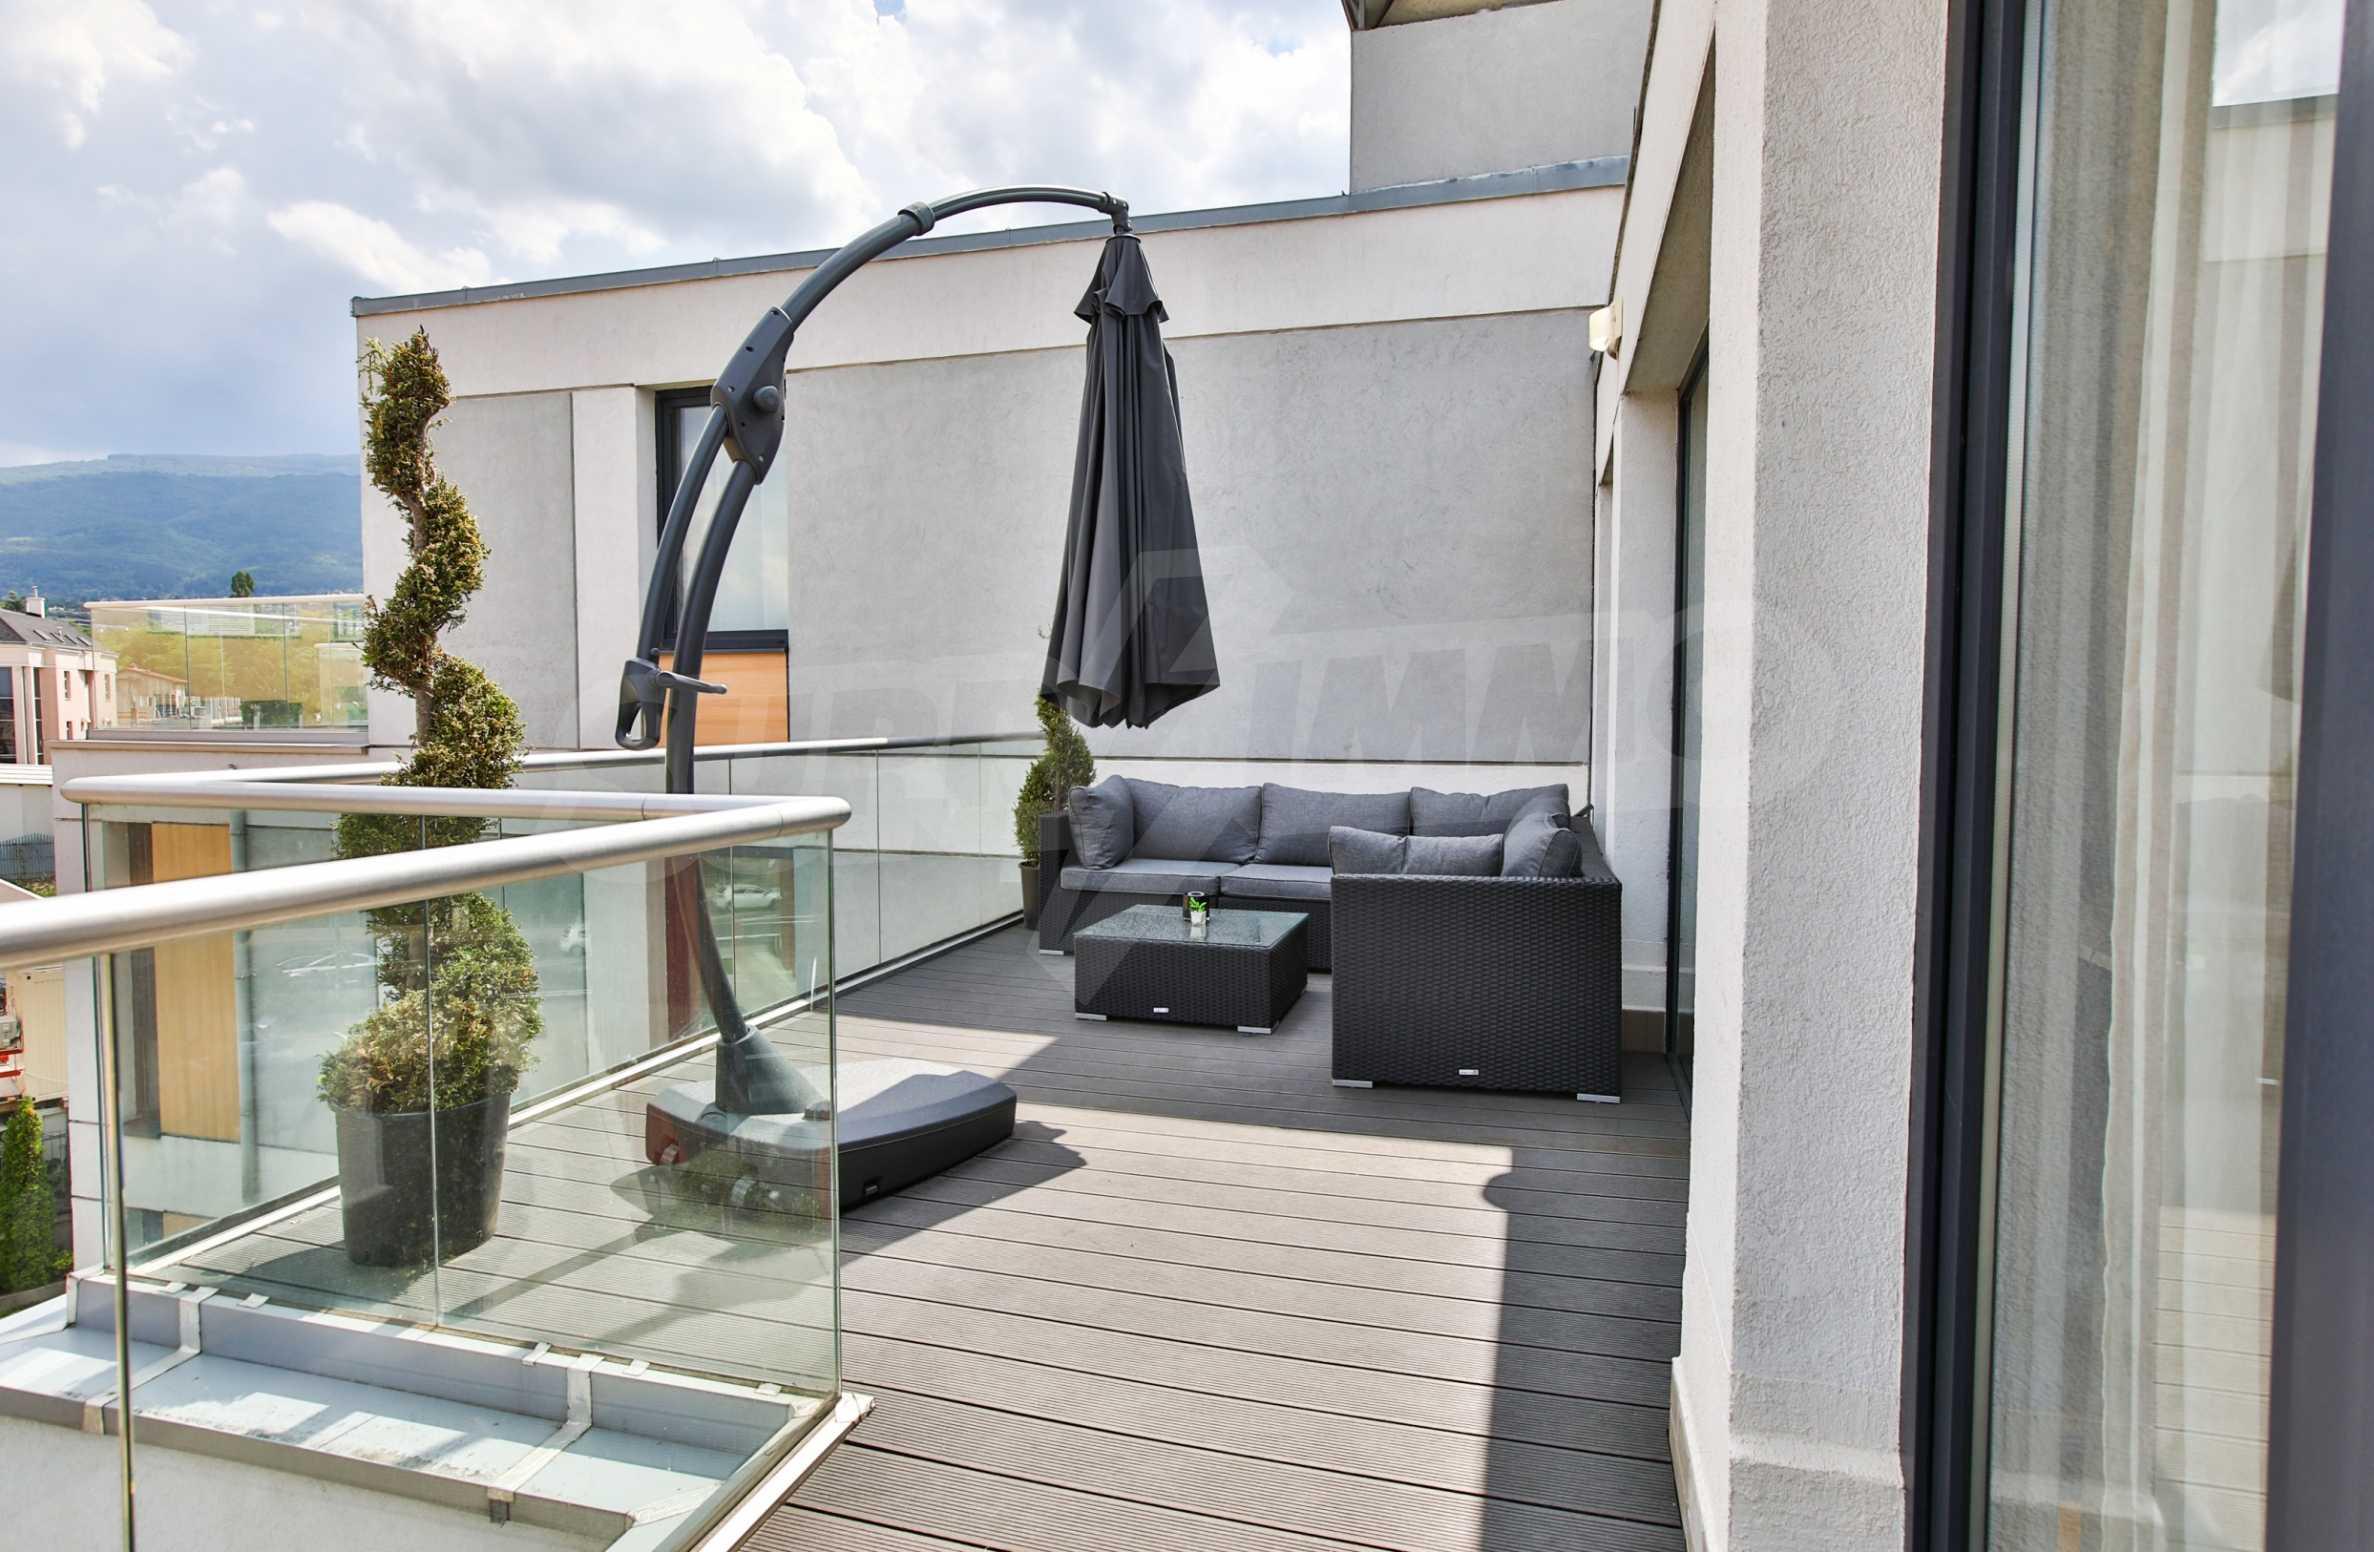 2-bedroom apartment for rent in Sofia, Bulgaria - Rentals - 2-bedroom apartment.